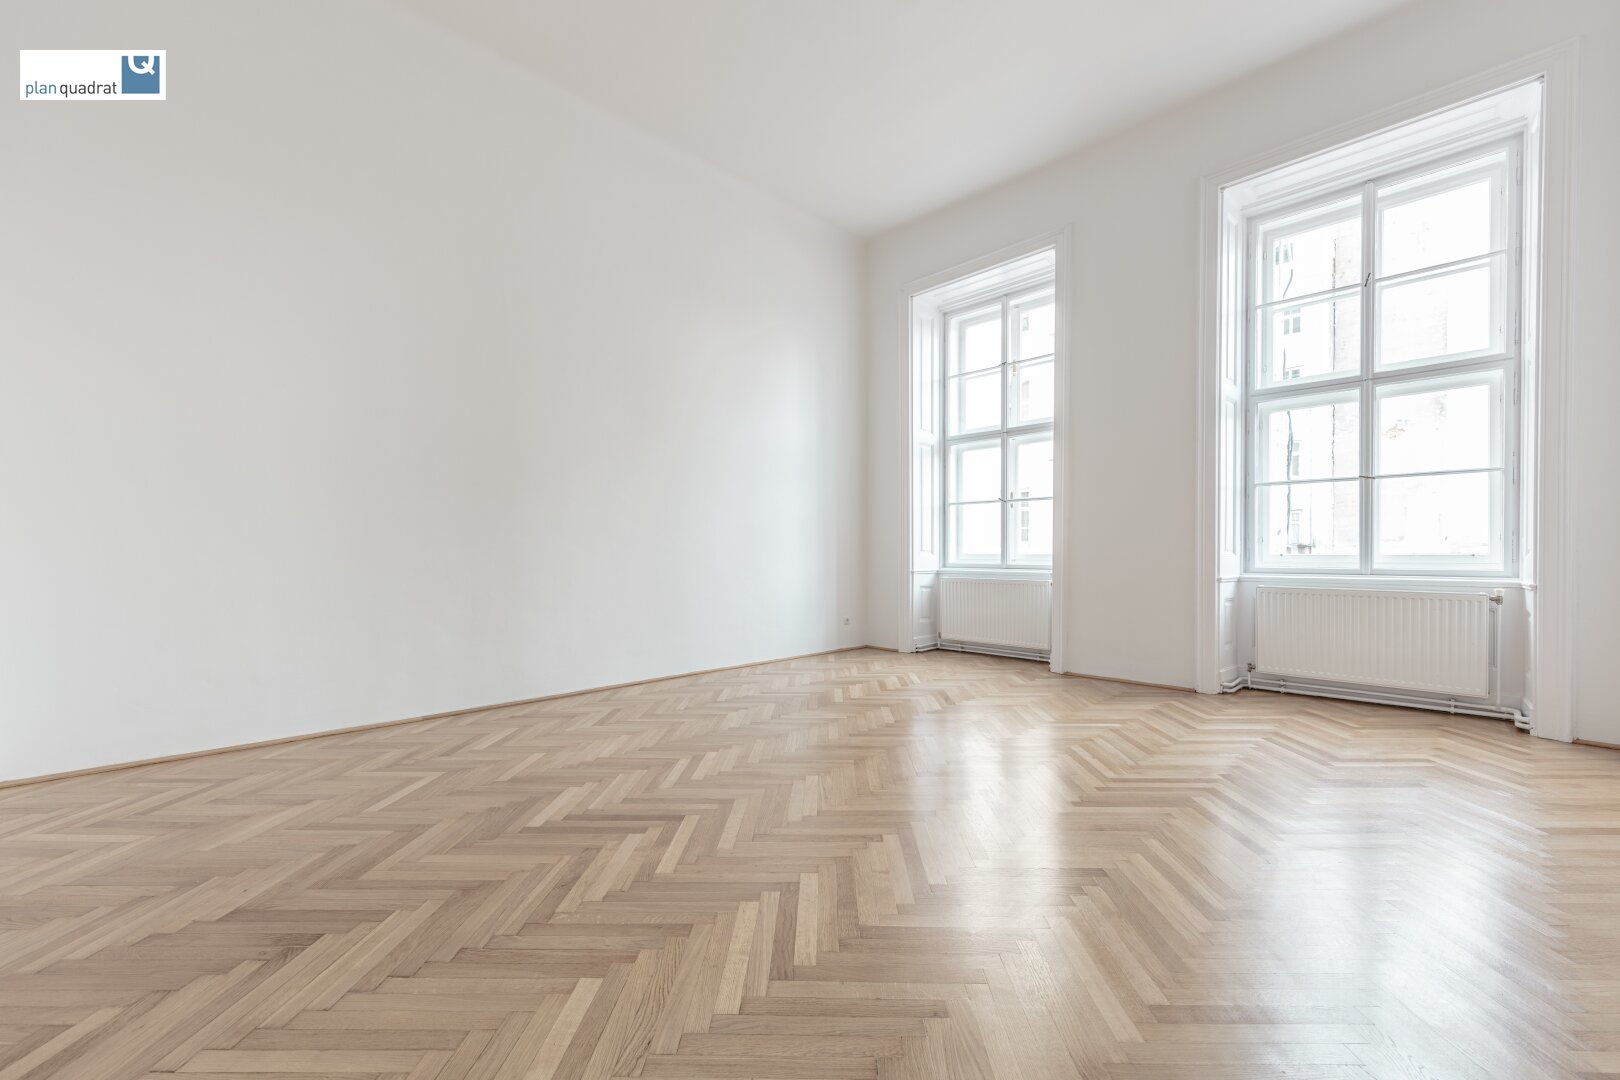 Zimmer 2 (ca. 28,20 m²) gem. Grundriss